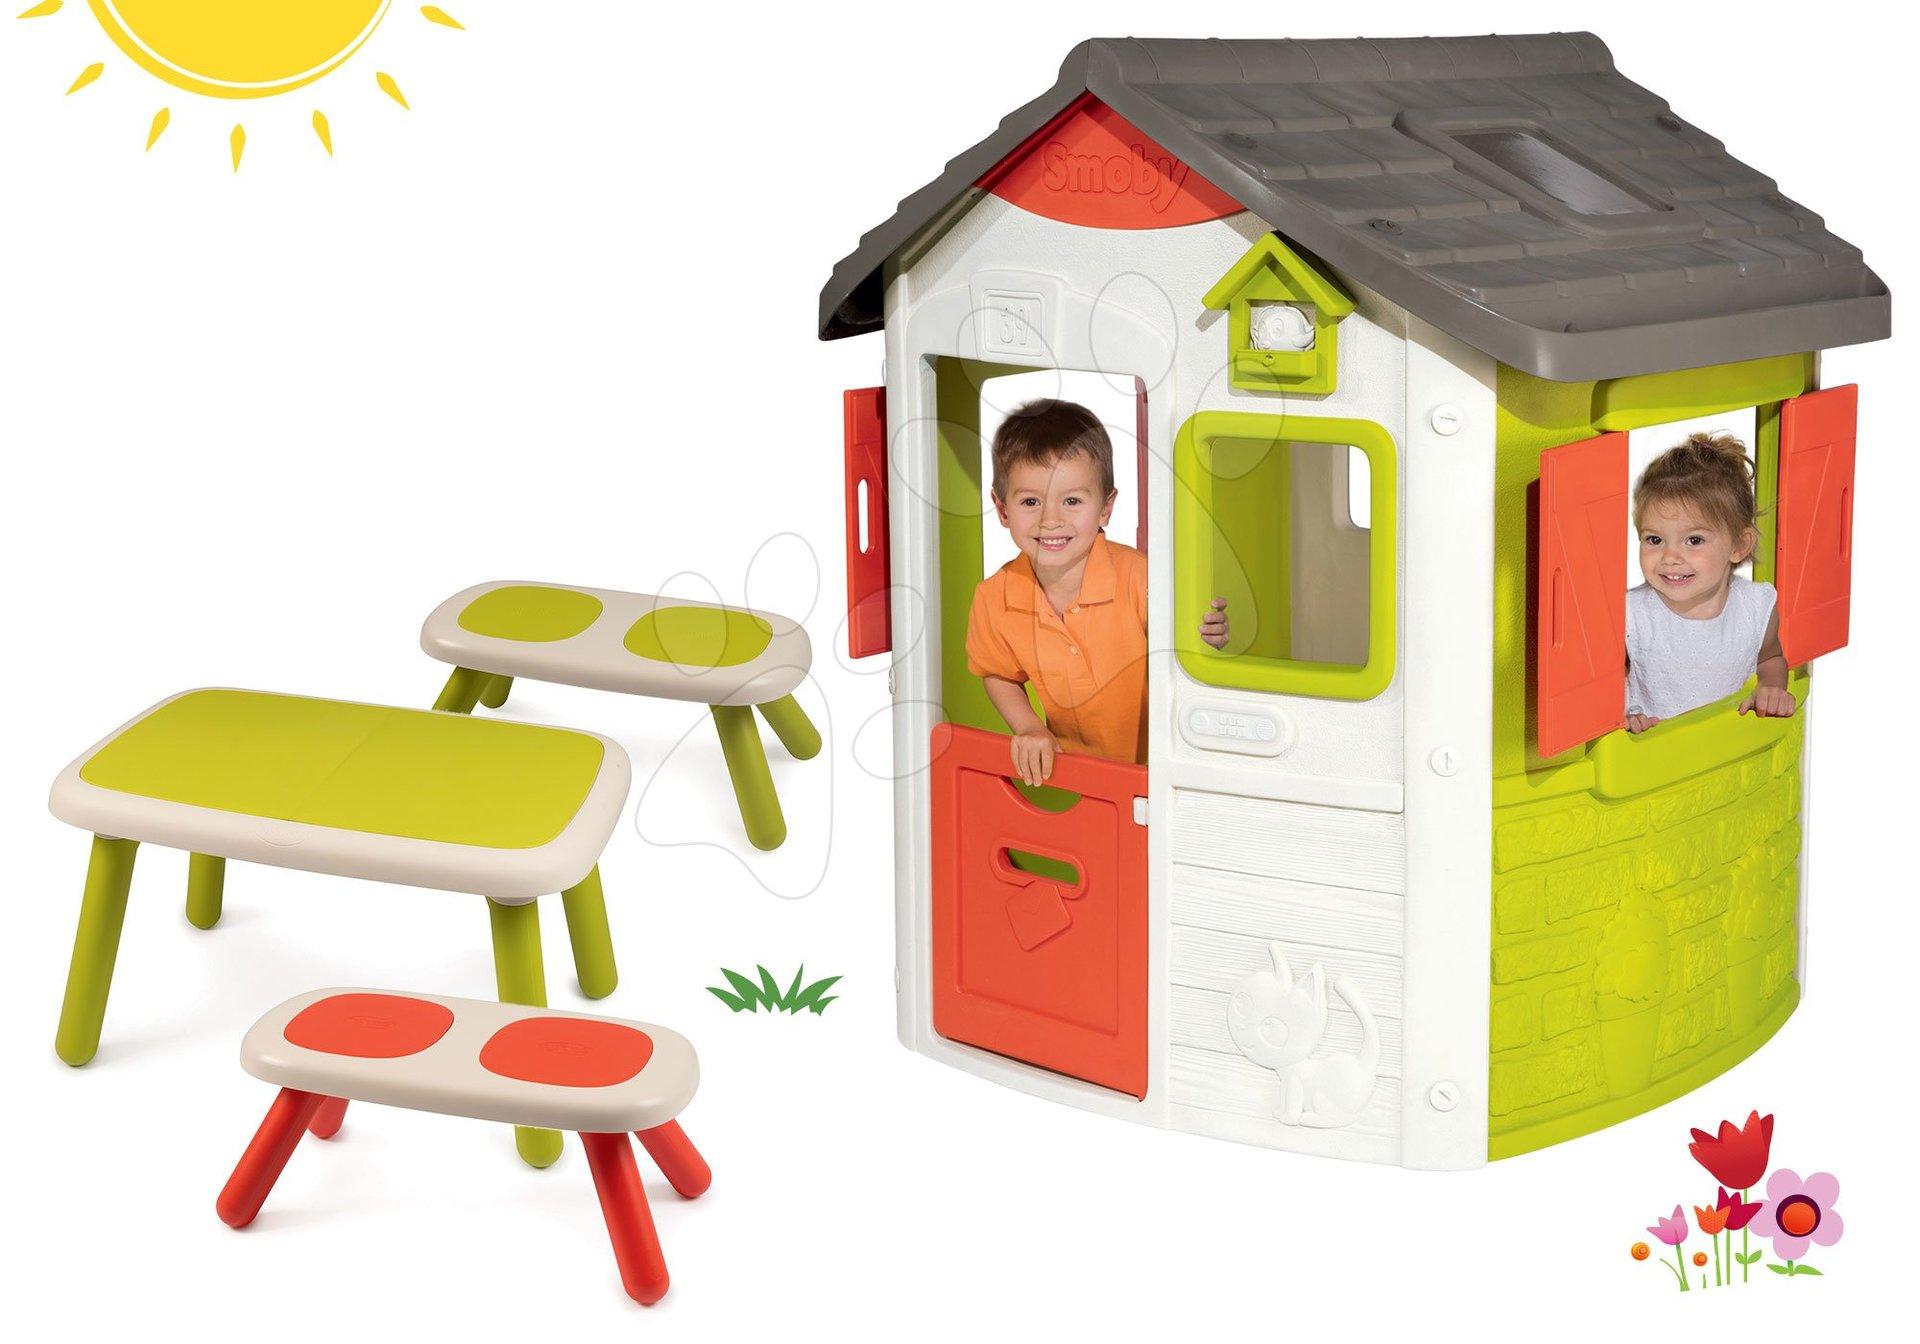 Set domček Neo Jura Lodge Smoby s dvoma dverami a stôl s dvoma lavicami KidBench